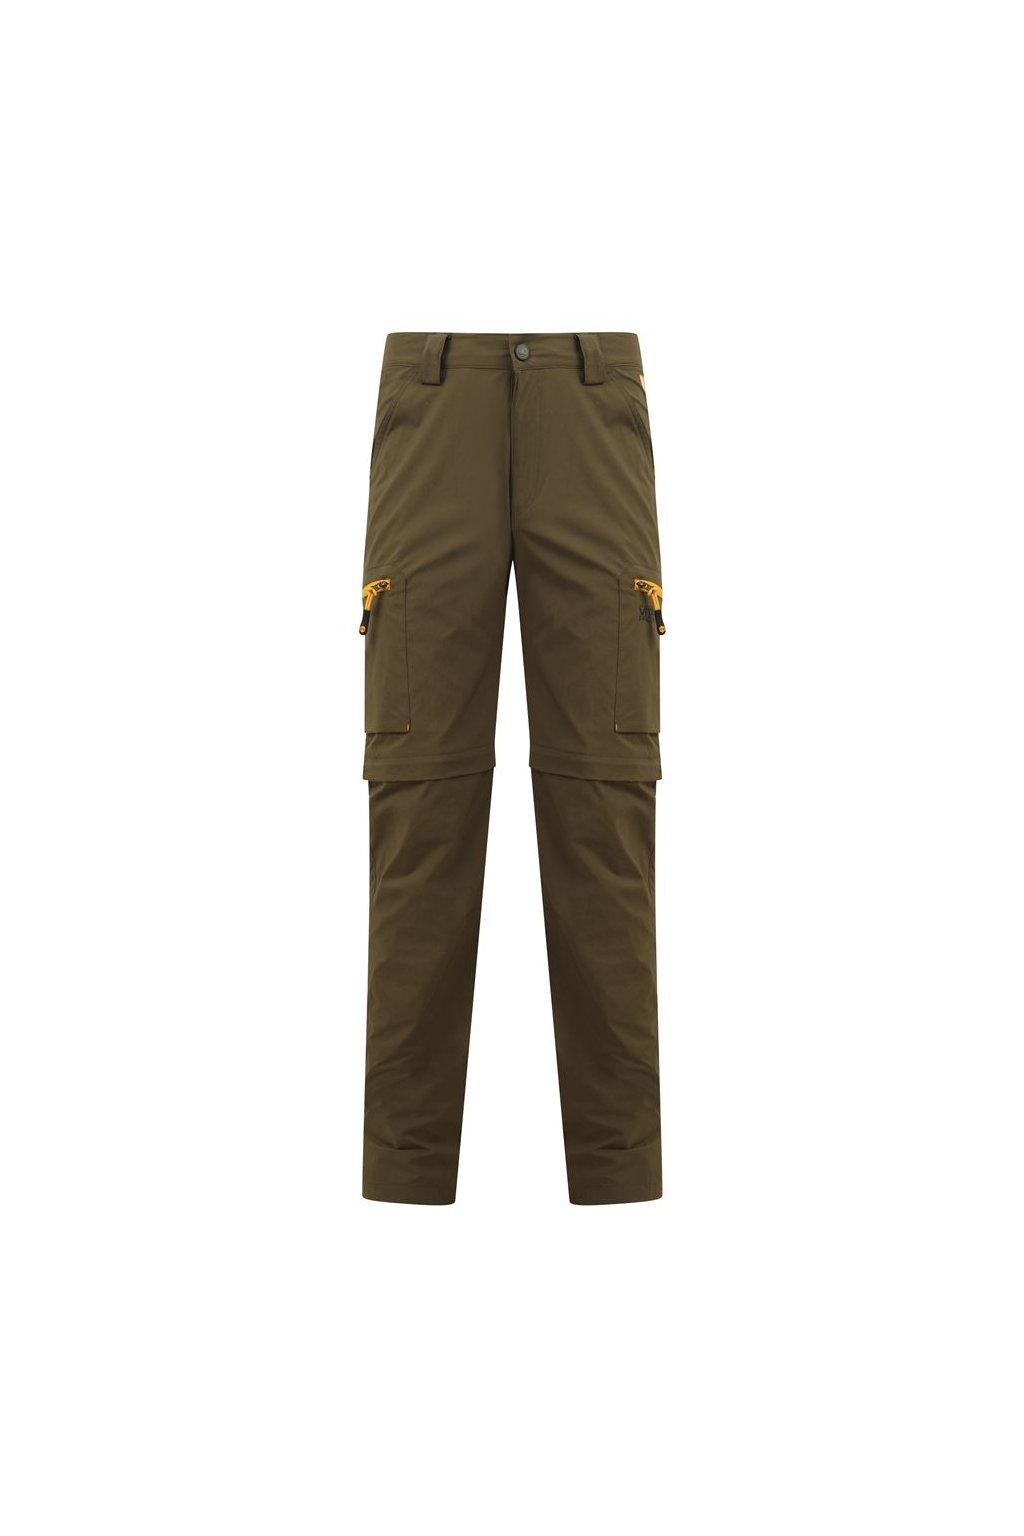 Navitas: Kalhoty Explorer Zip Off Trouser Velikost XL